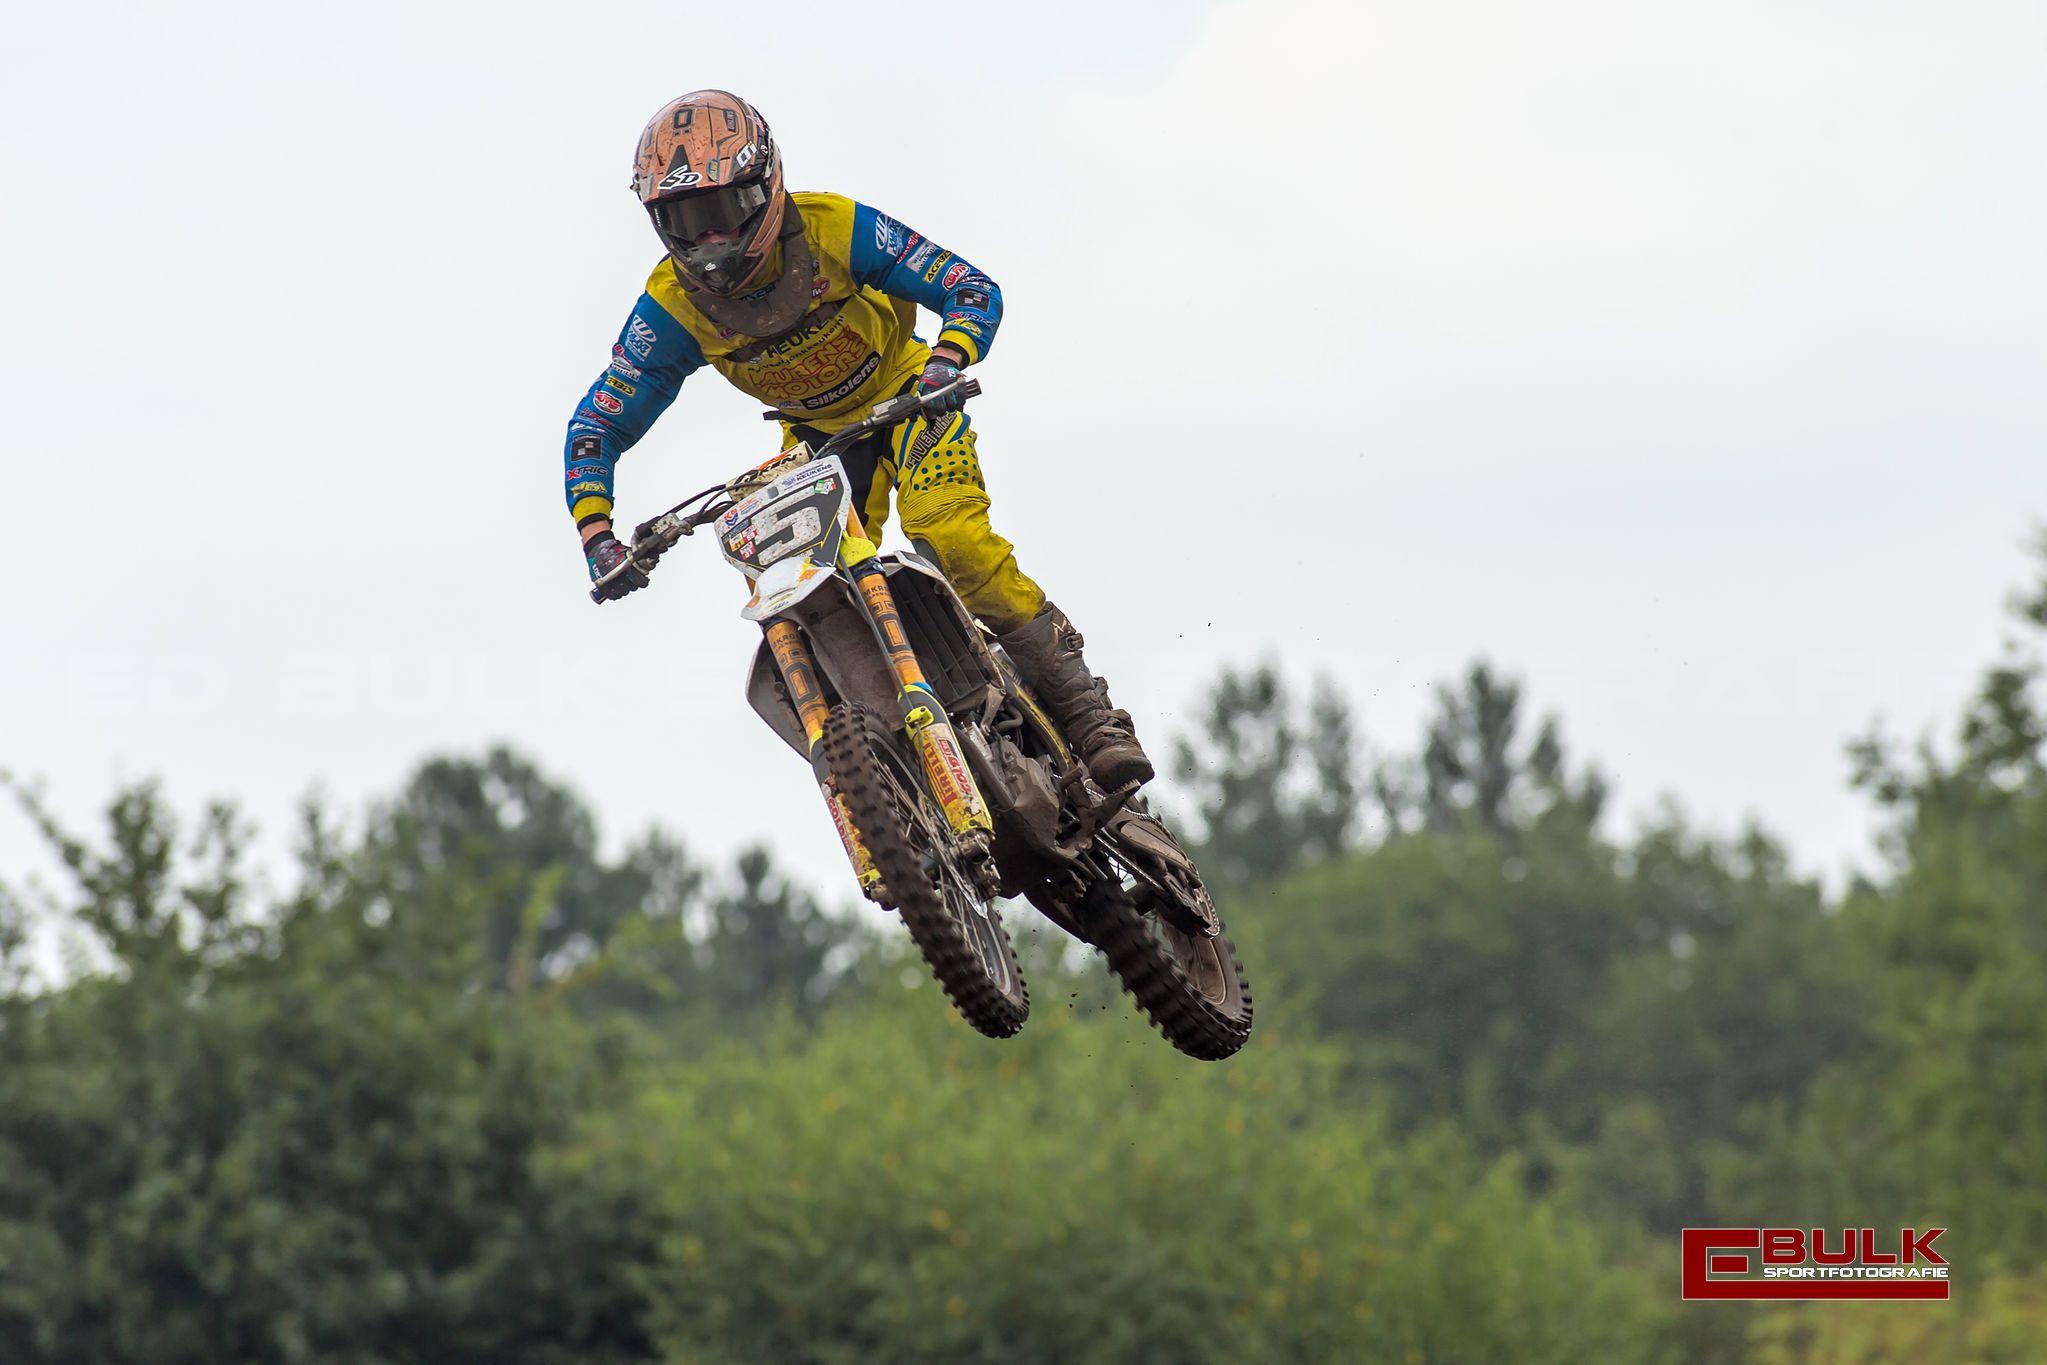 eebs2263-ed_bulk_sportfotografie